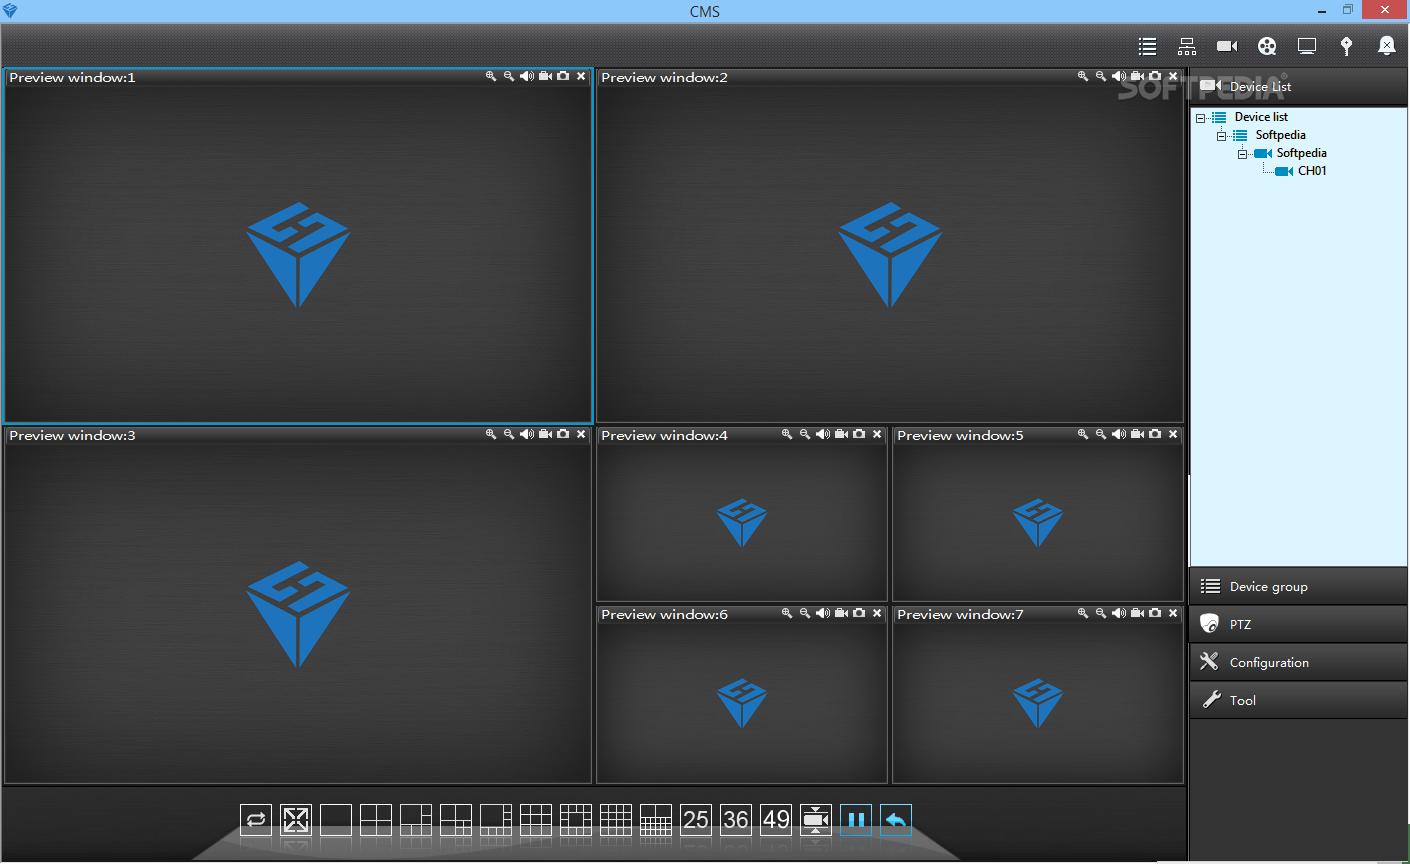 Freeware Nvr Software